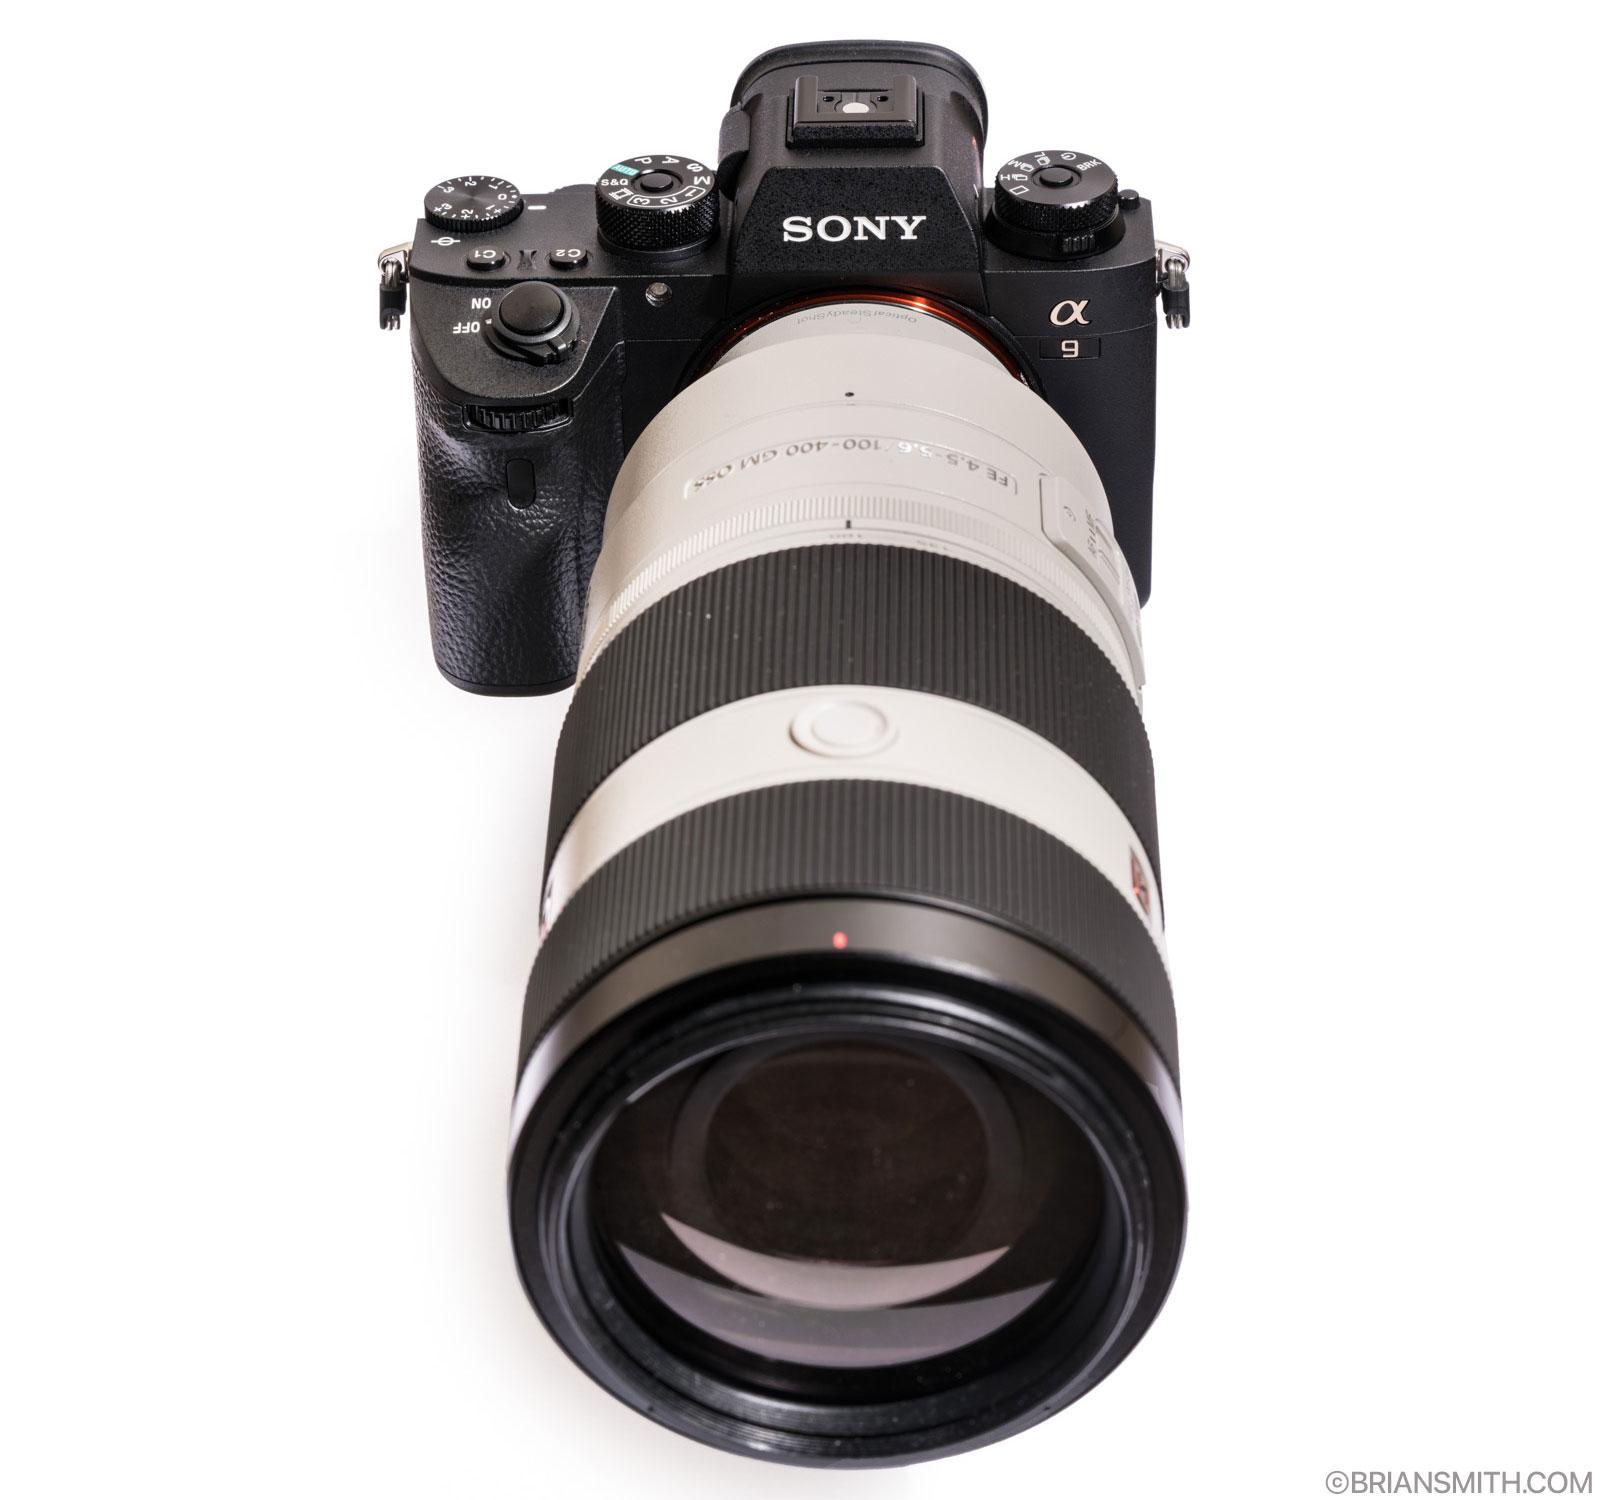 Sony a9 camera with FE 100-400 F4.5-5.6 GM OSS lens